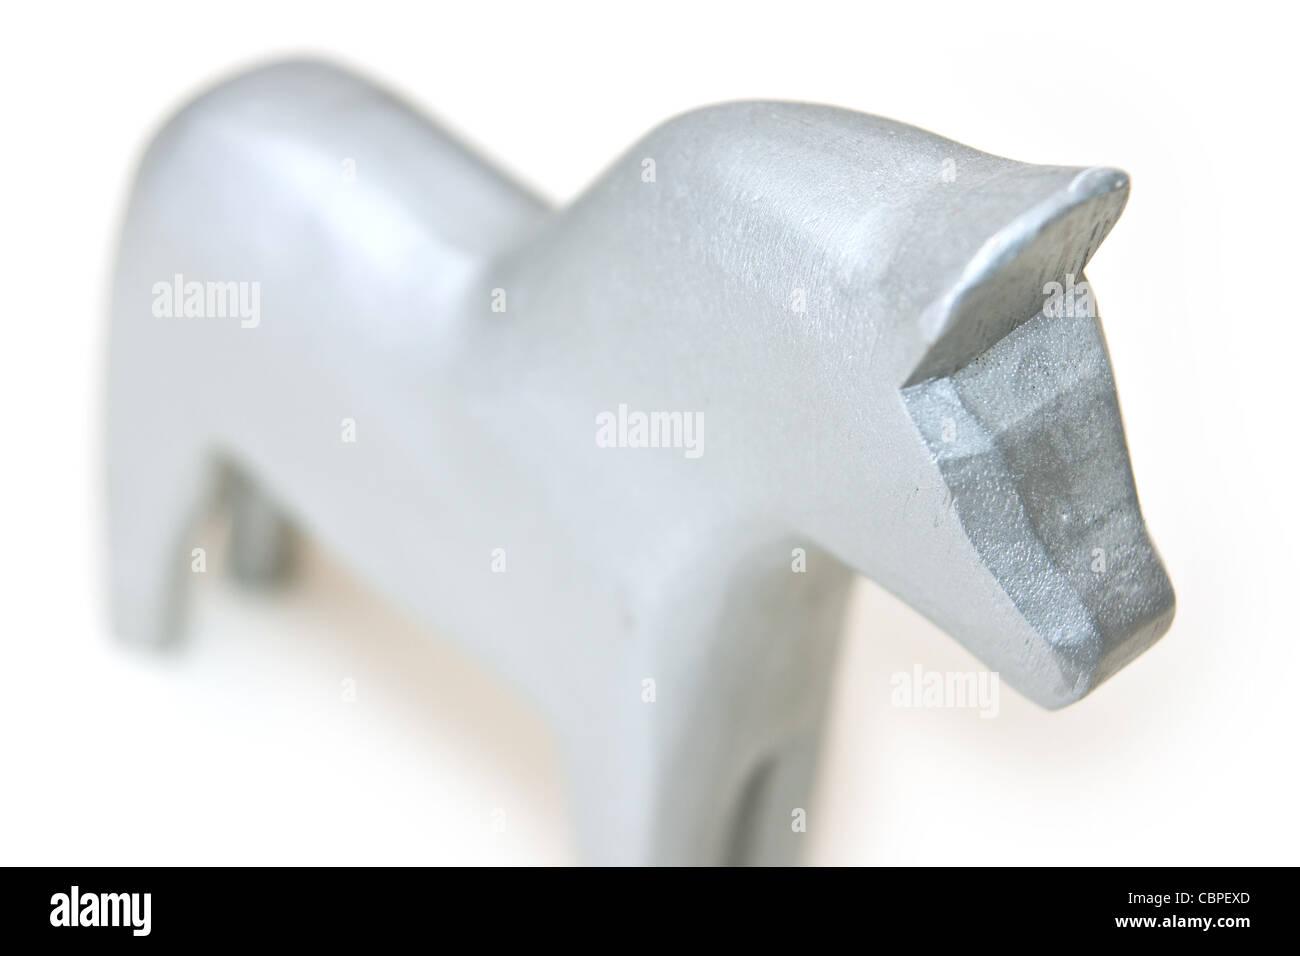 Silver dala horse - Stock Image